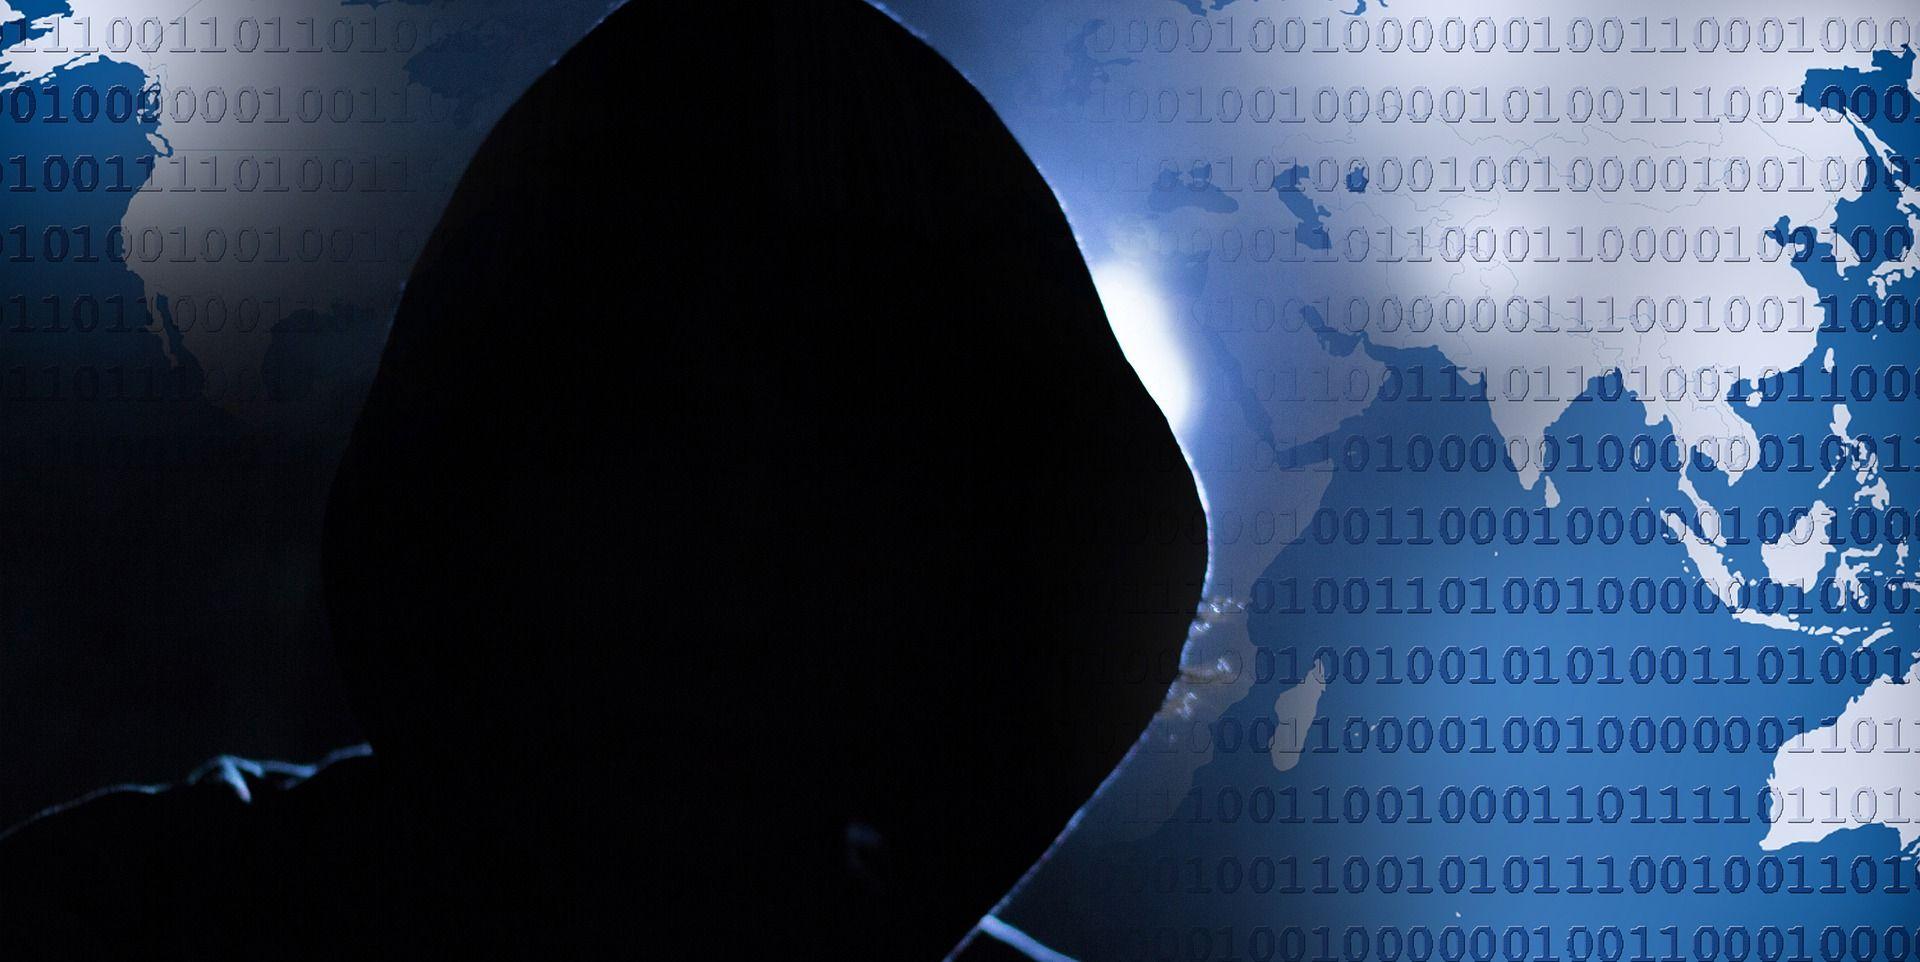 Britanske političke stranke upozorene na prijetnju ruskih hakerskih napada